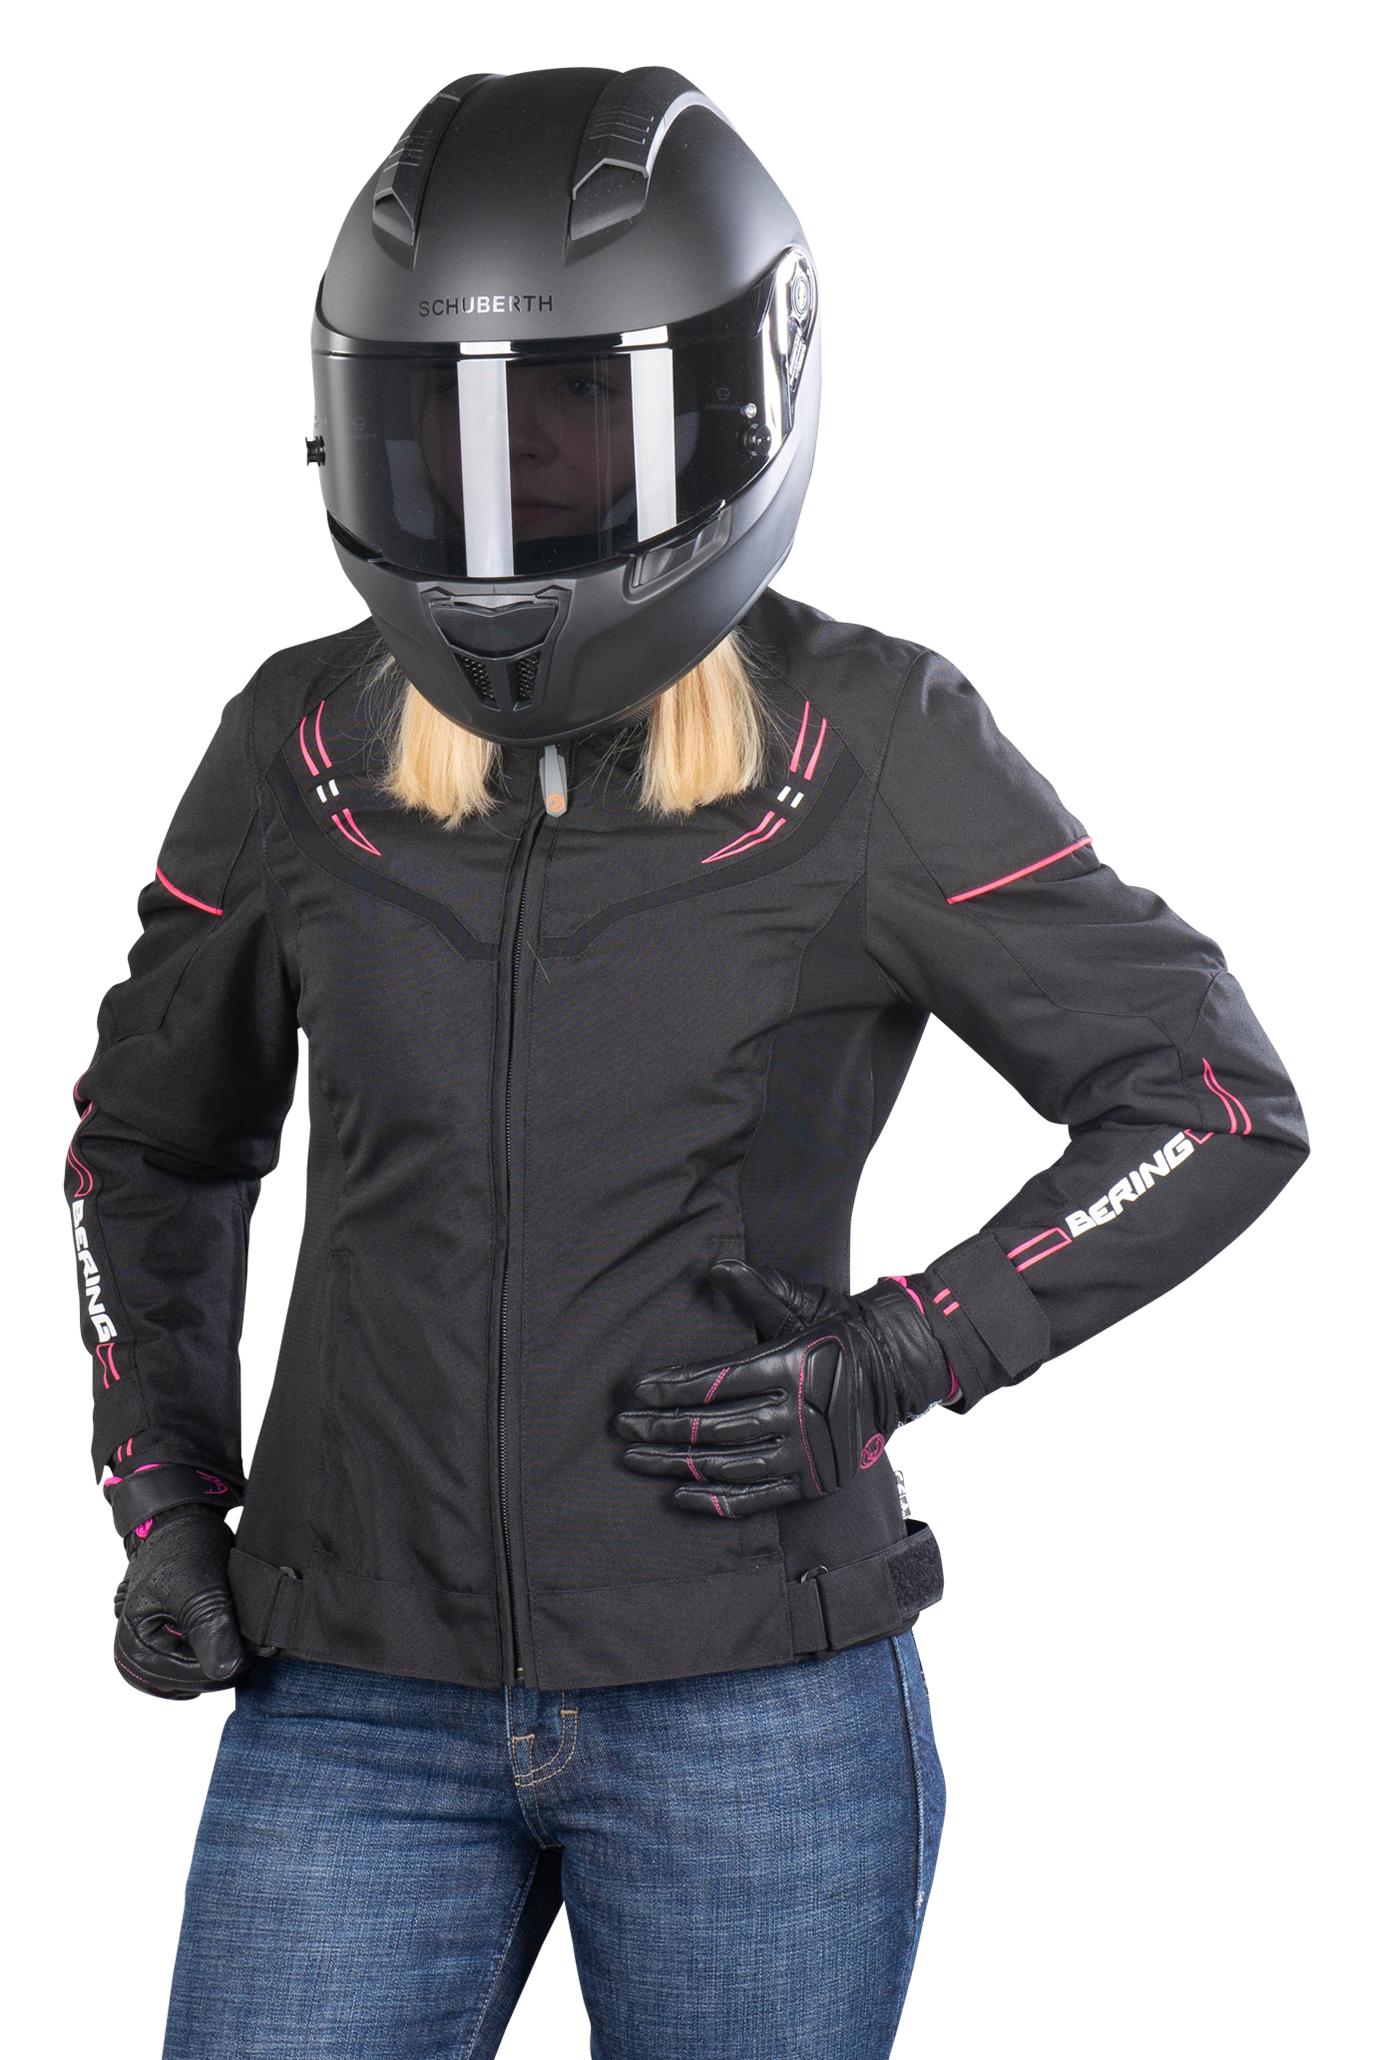 Bering Blouson Moto Femme Bering Lady Paradise Noir-Fuchsia 36 (XS)